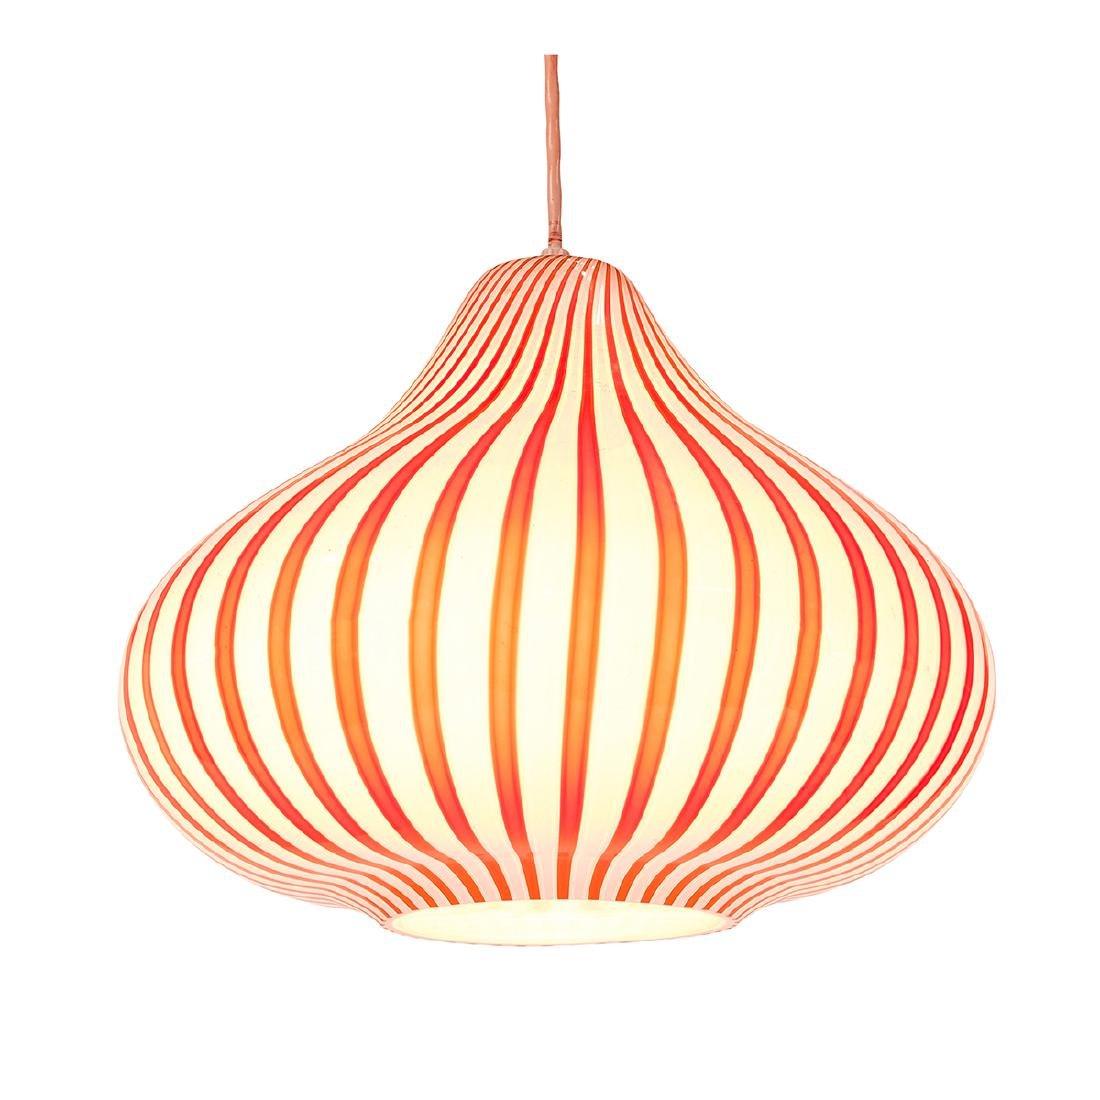 Massimo Vignelli for Venini hanging light